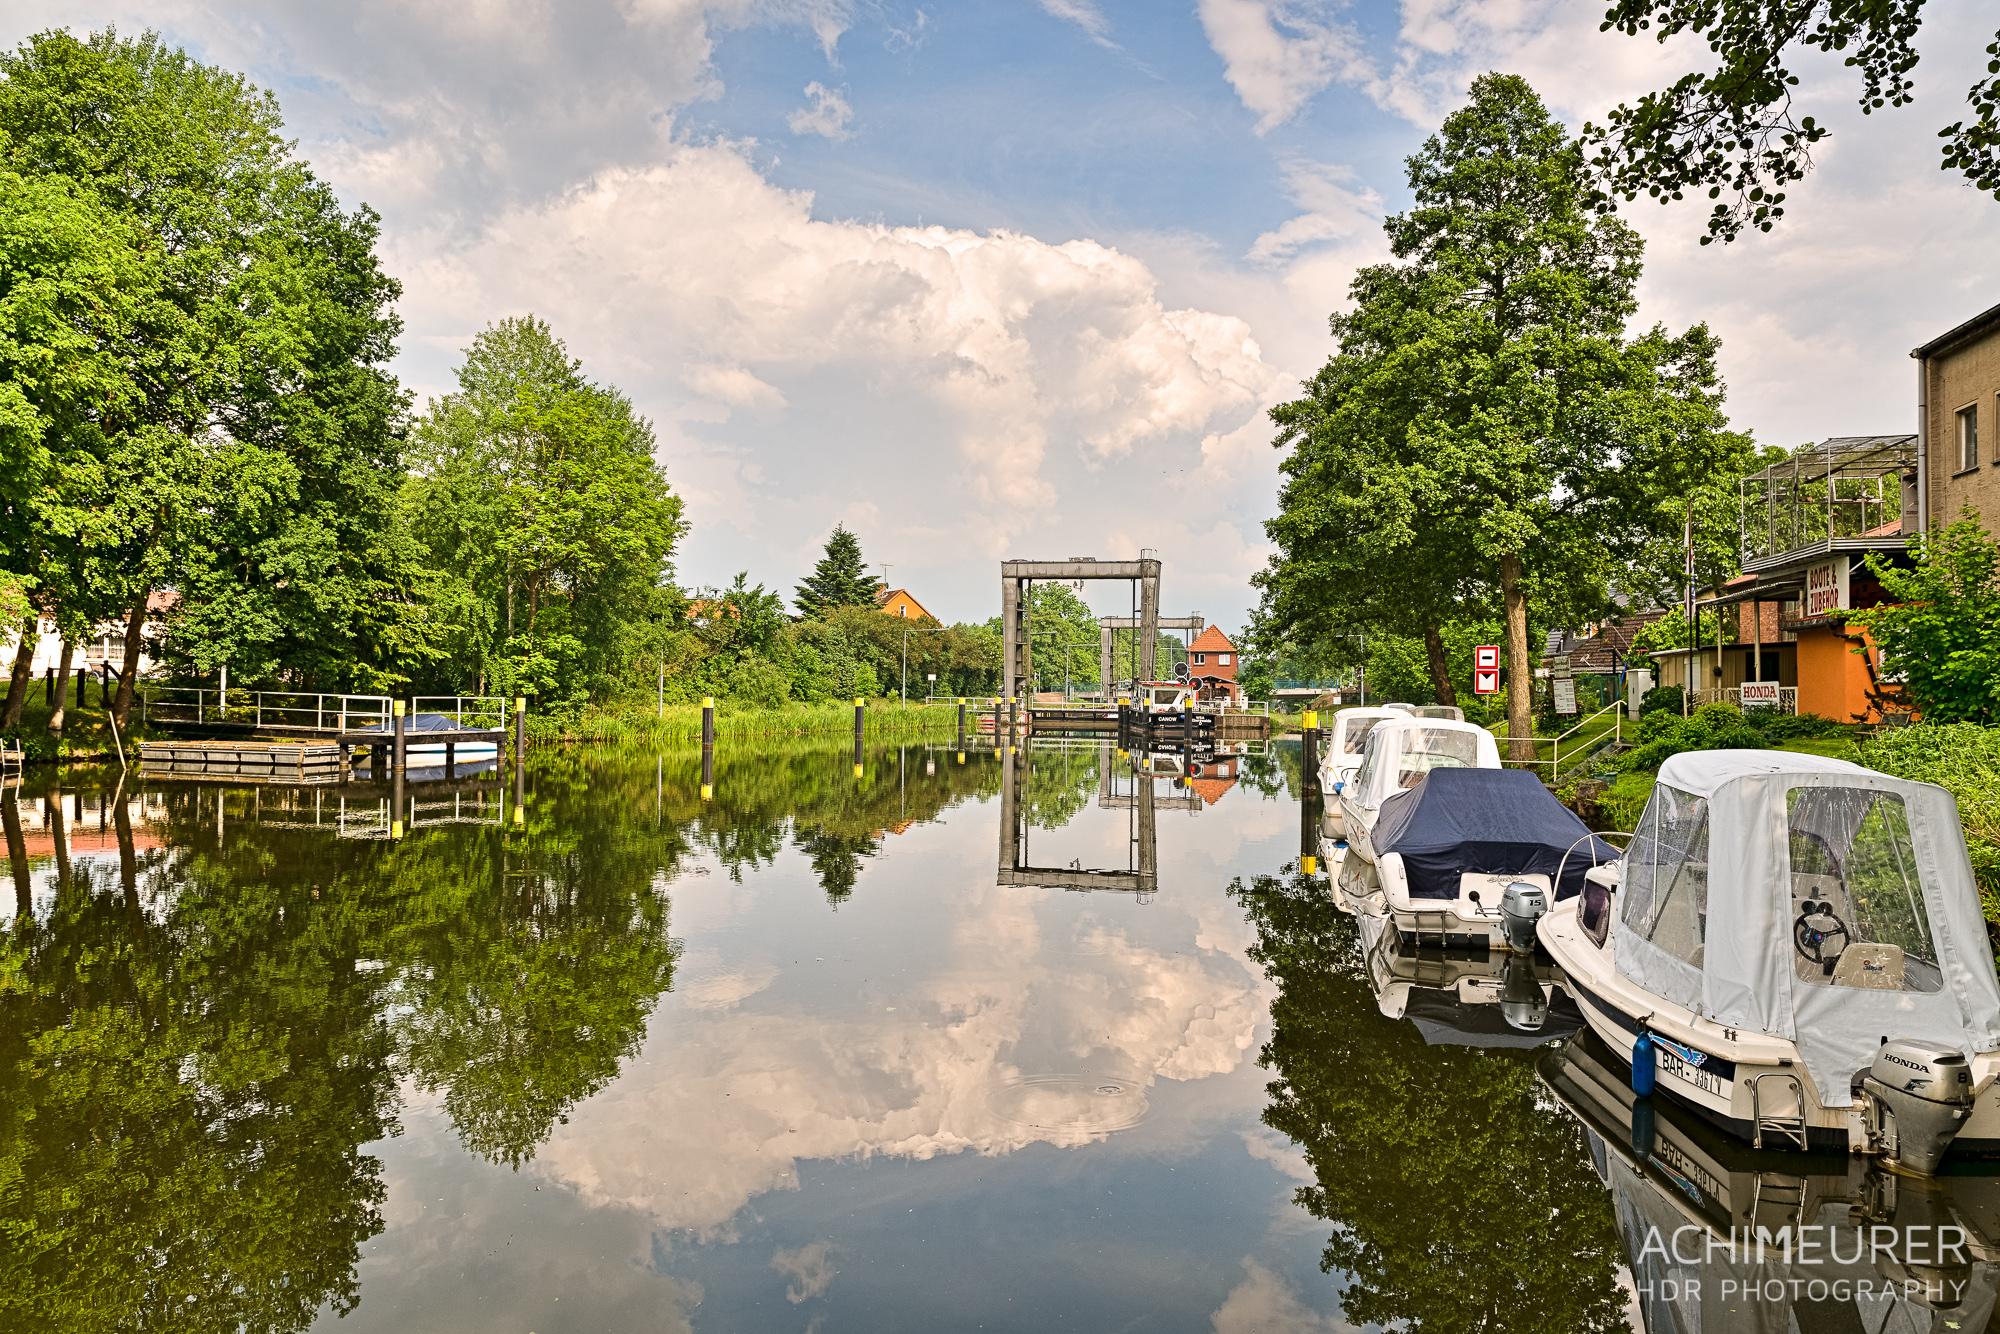 Hausboot-Kuhnle-Mueritz-Mecklenburg-Vorpommern-See_2601_600_599_HDR-Bearbeitet